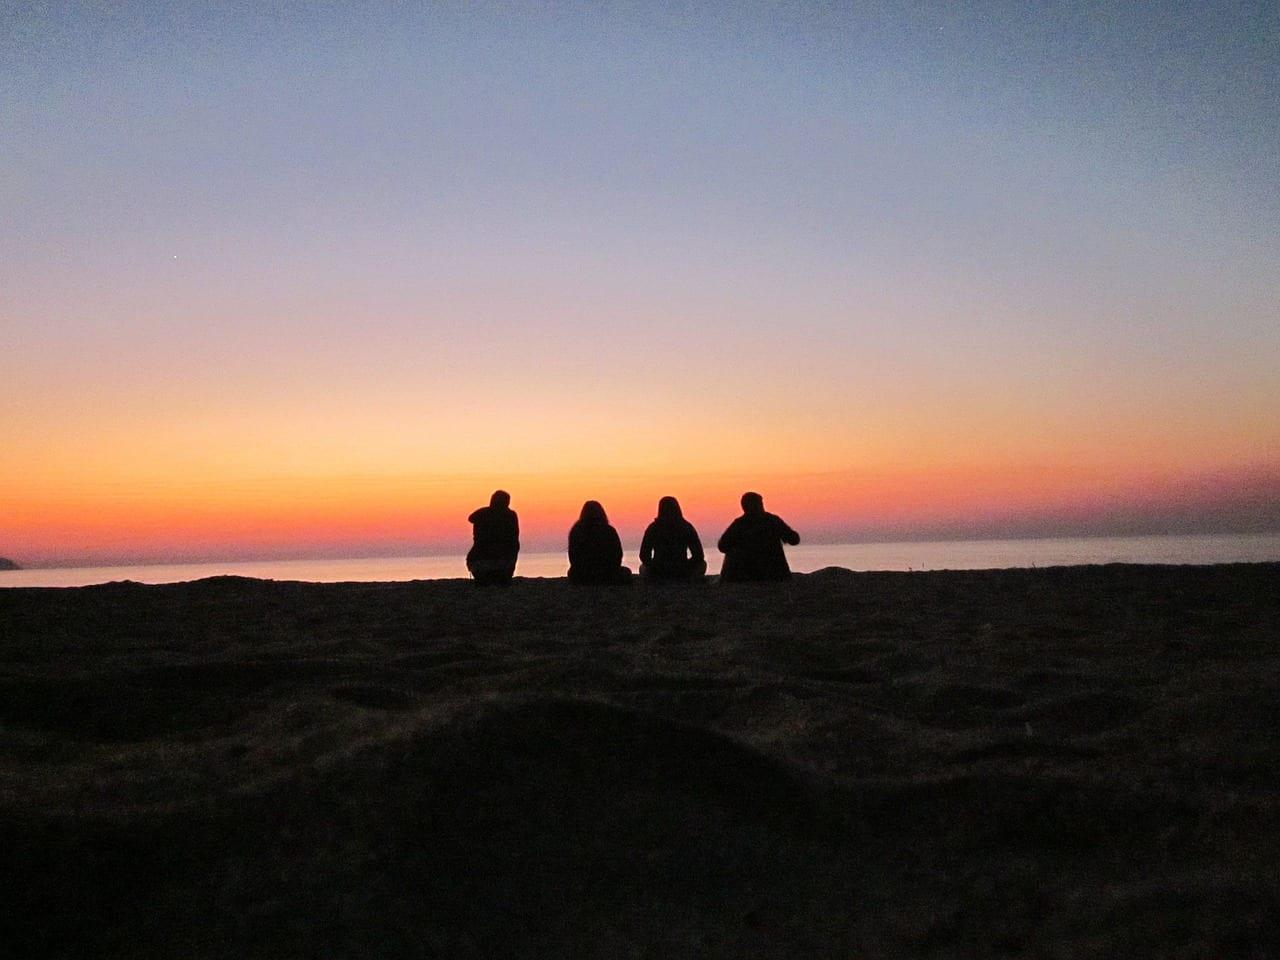 Image 2 sunset